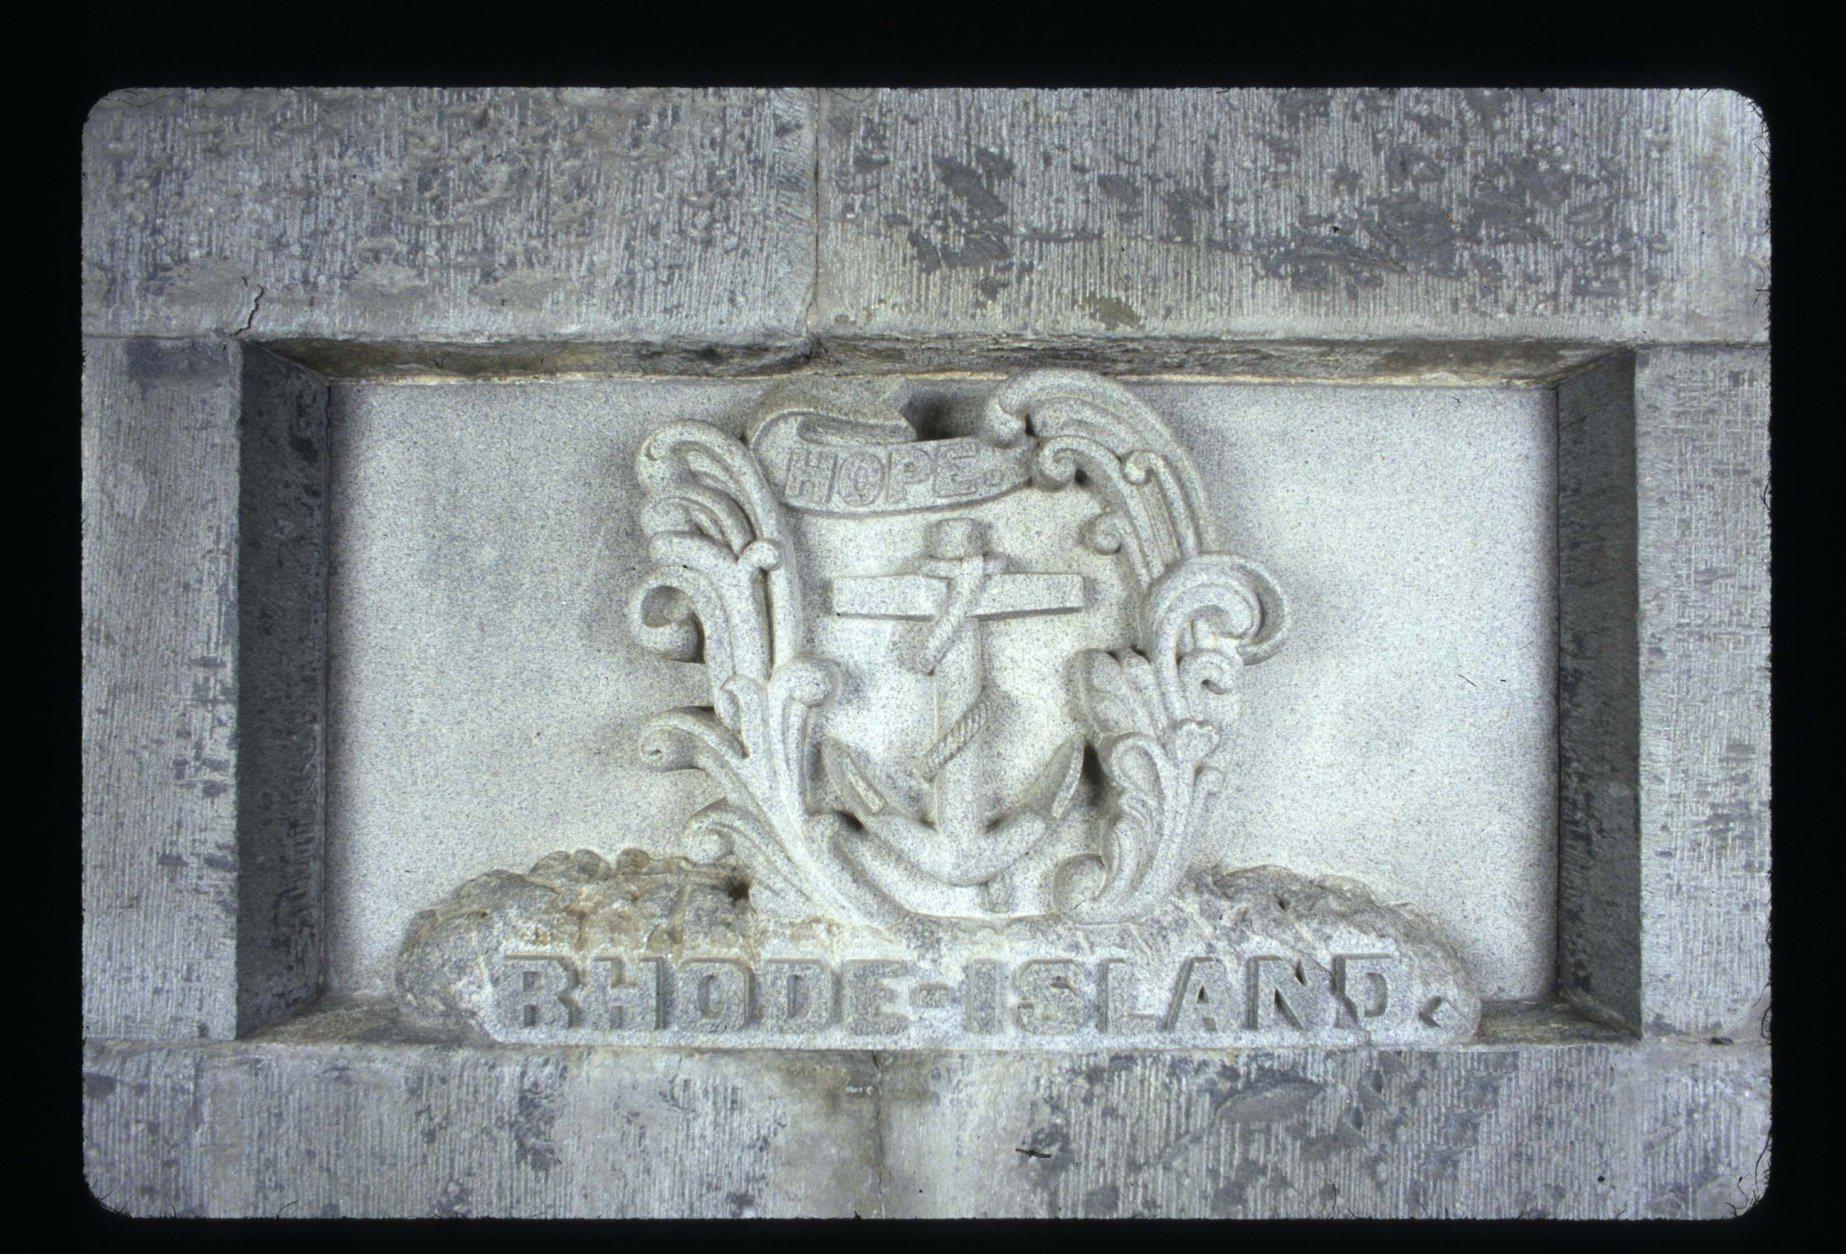 <p>Rhode Island&#8217;s stone is pretty elaborate.</p>